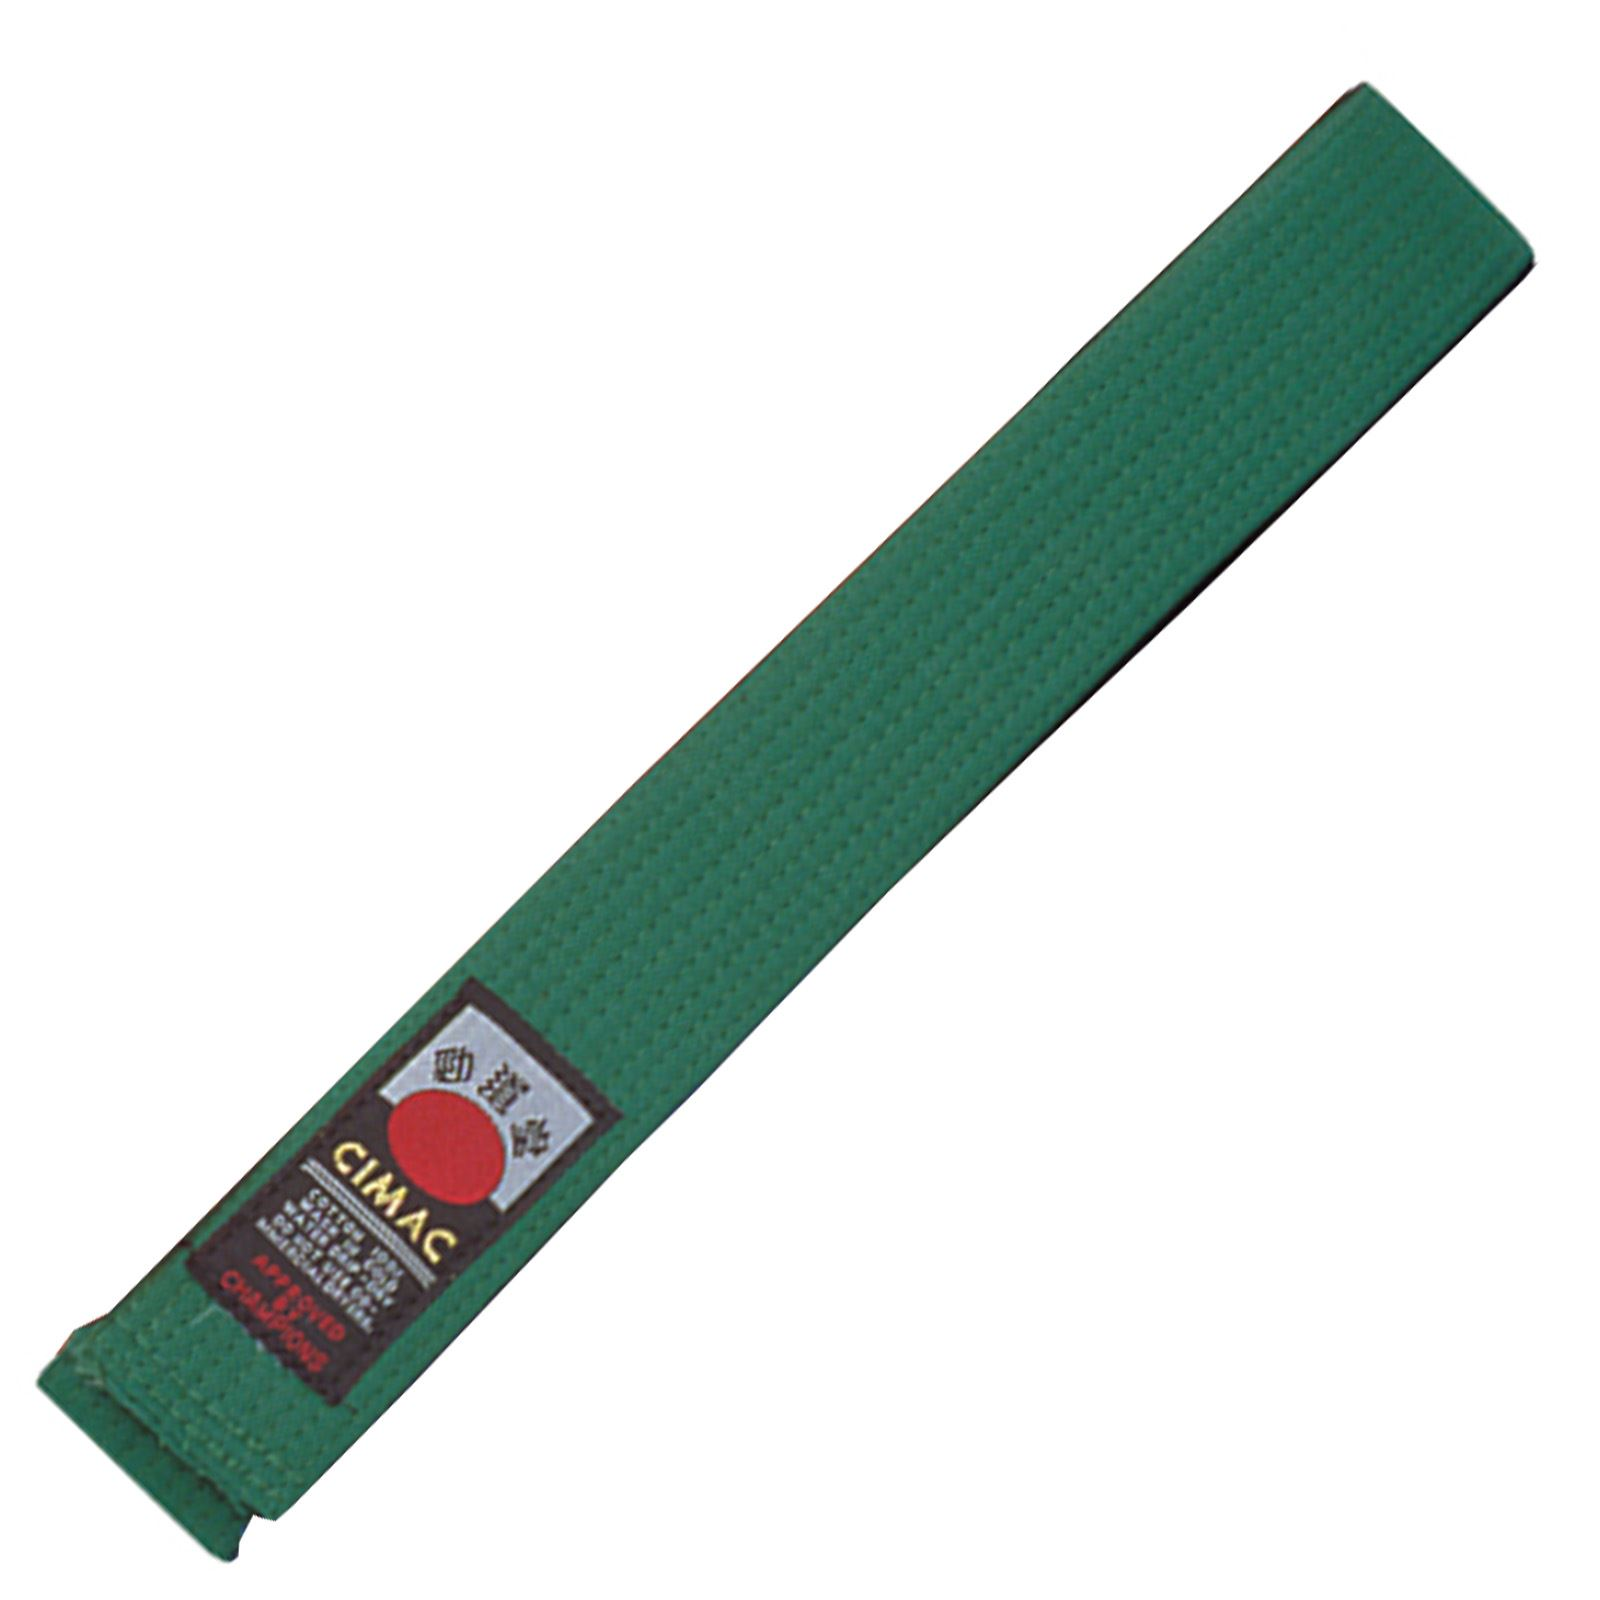 Cimac-Judo-Karate-Taekwondo-Plain-Coloured-Martial-Arts-Belt-UniformVarious-Size thumbnail 12